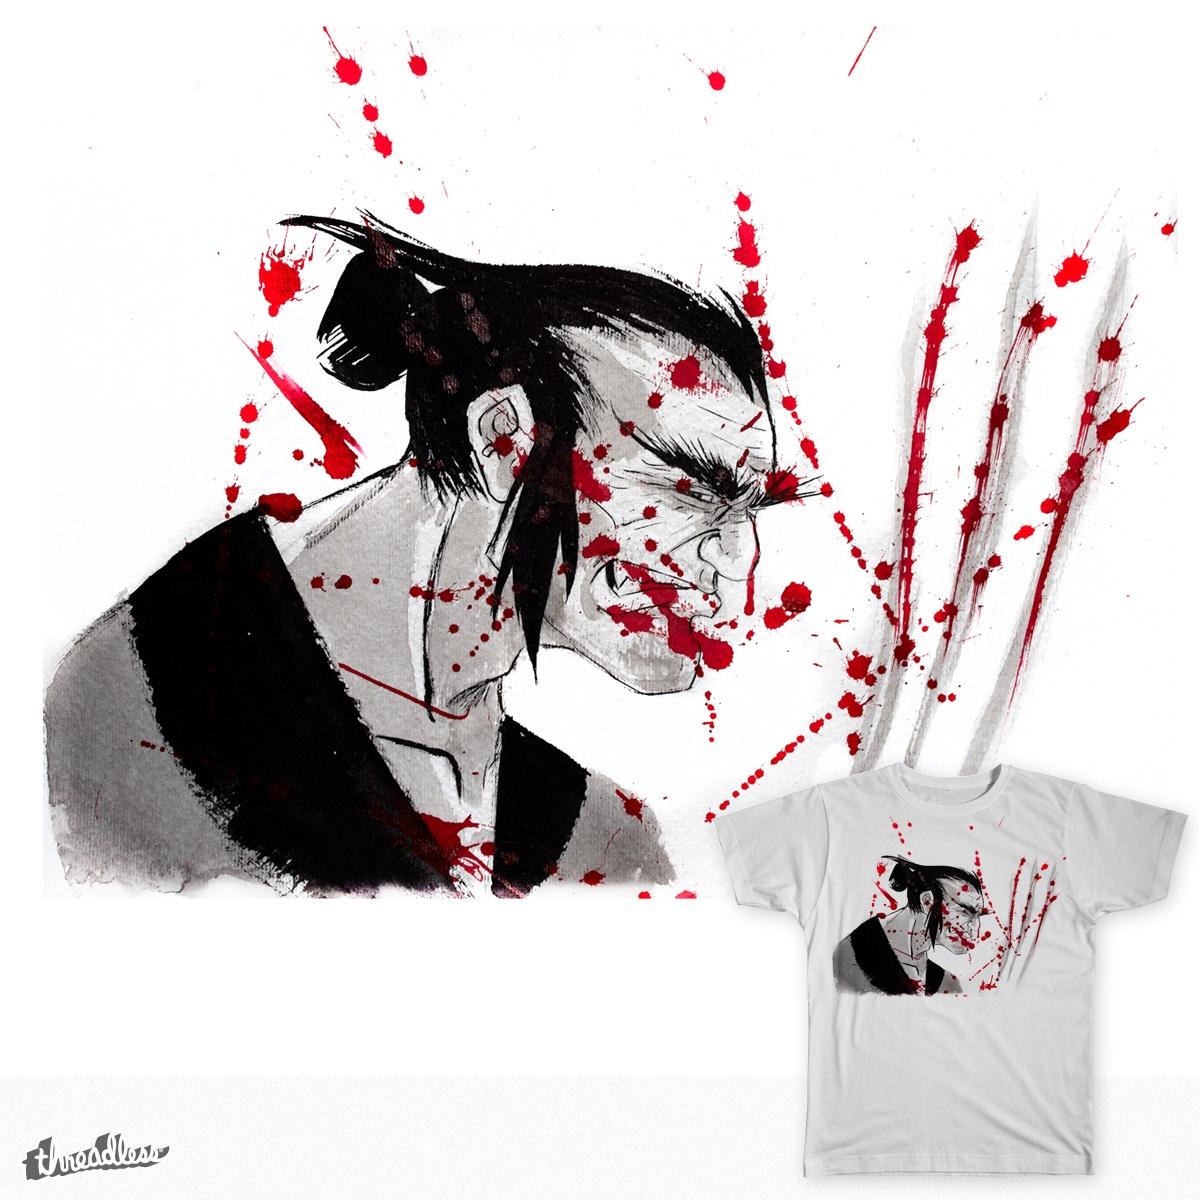 Berserker Ronin by ARCADEO on Threadless